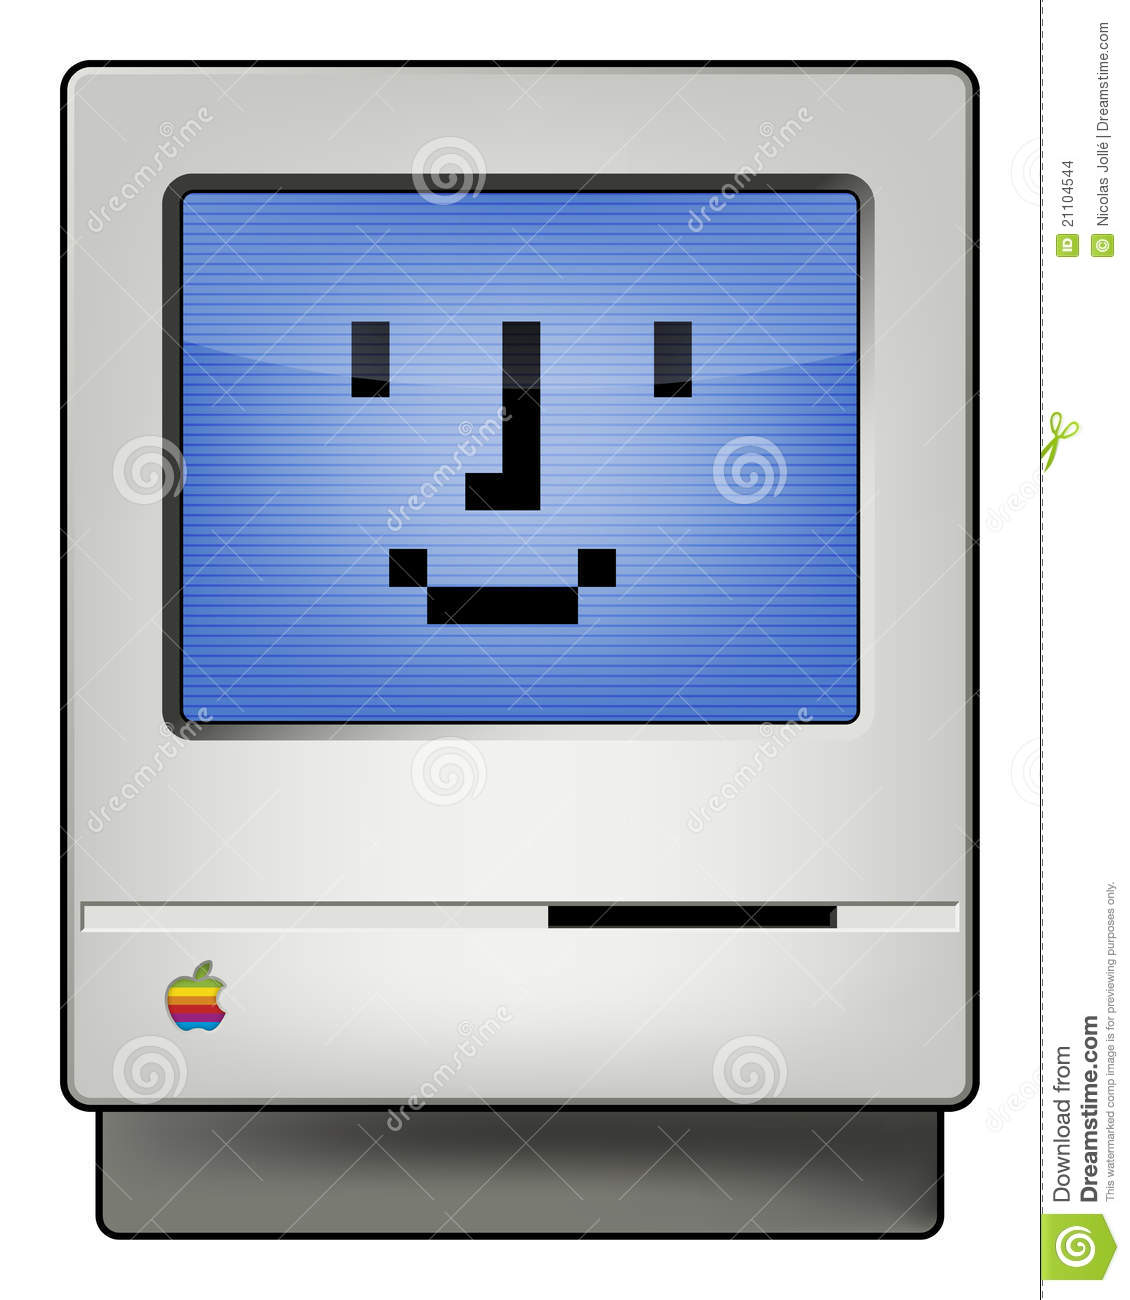 1130x1300 Free Clip Art For Mac Many Interesting Cliparts